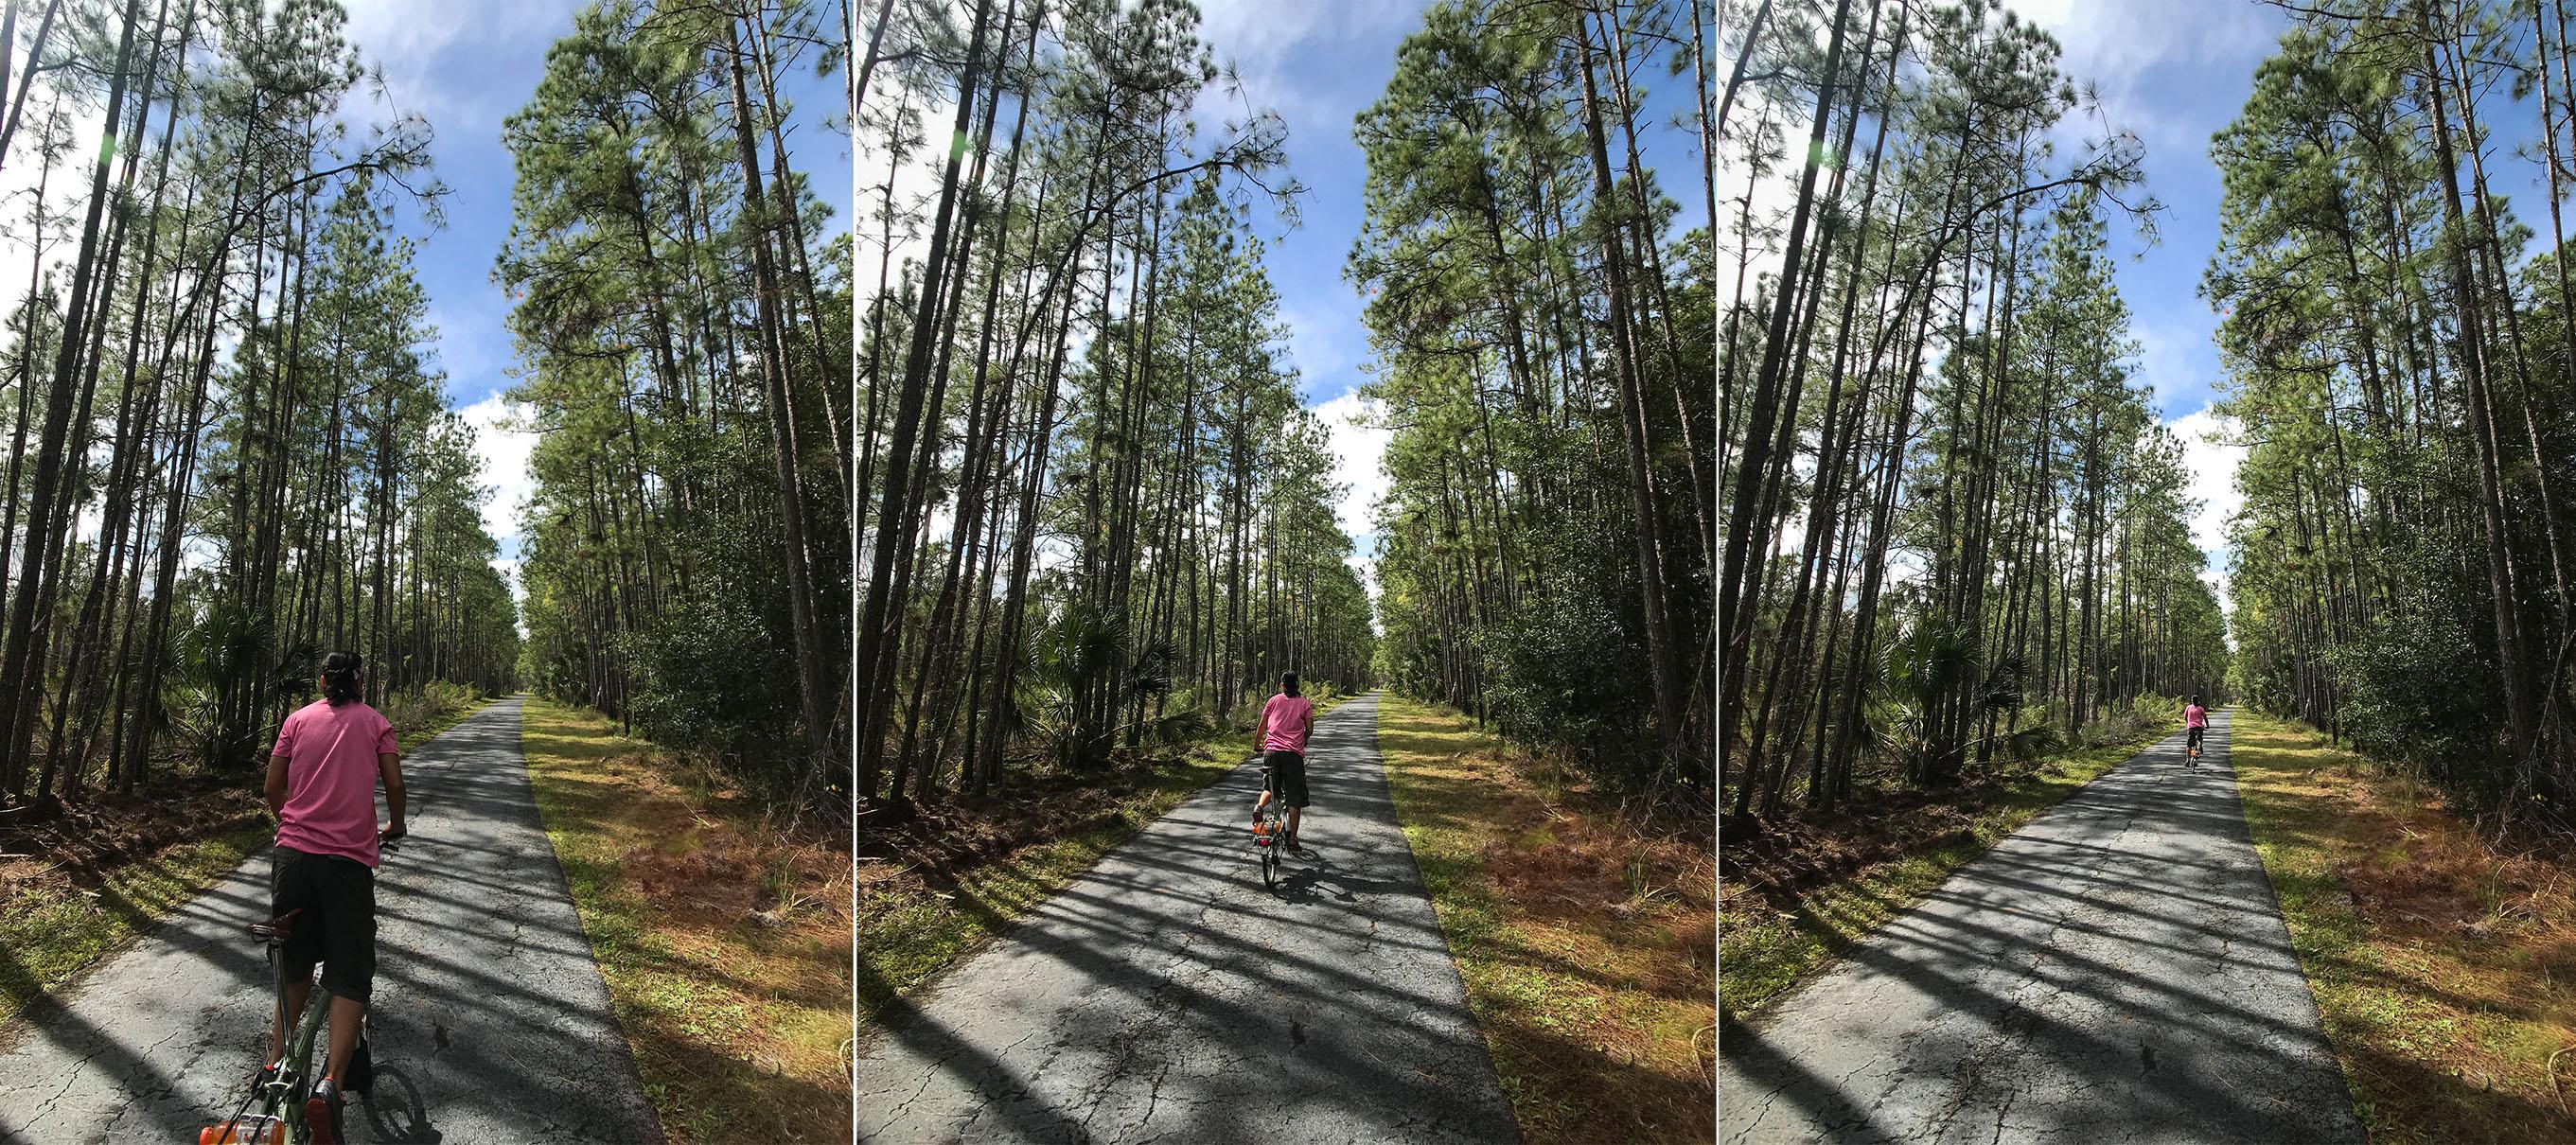 Flatwoods Wilderness Trail - Woody Biking